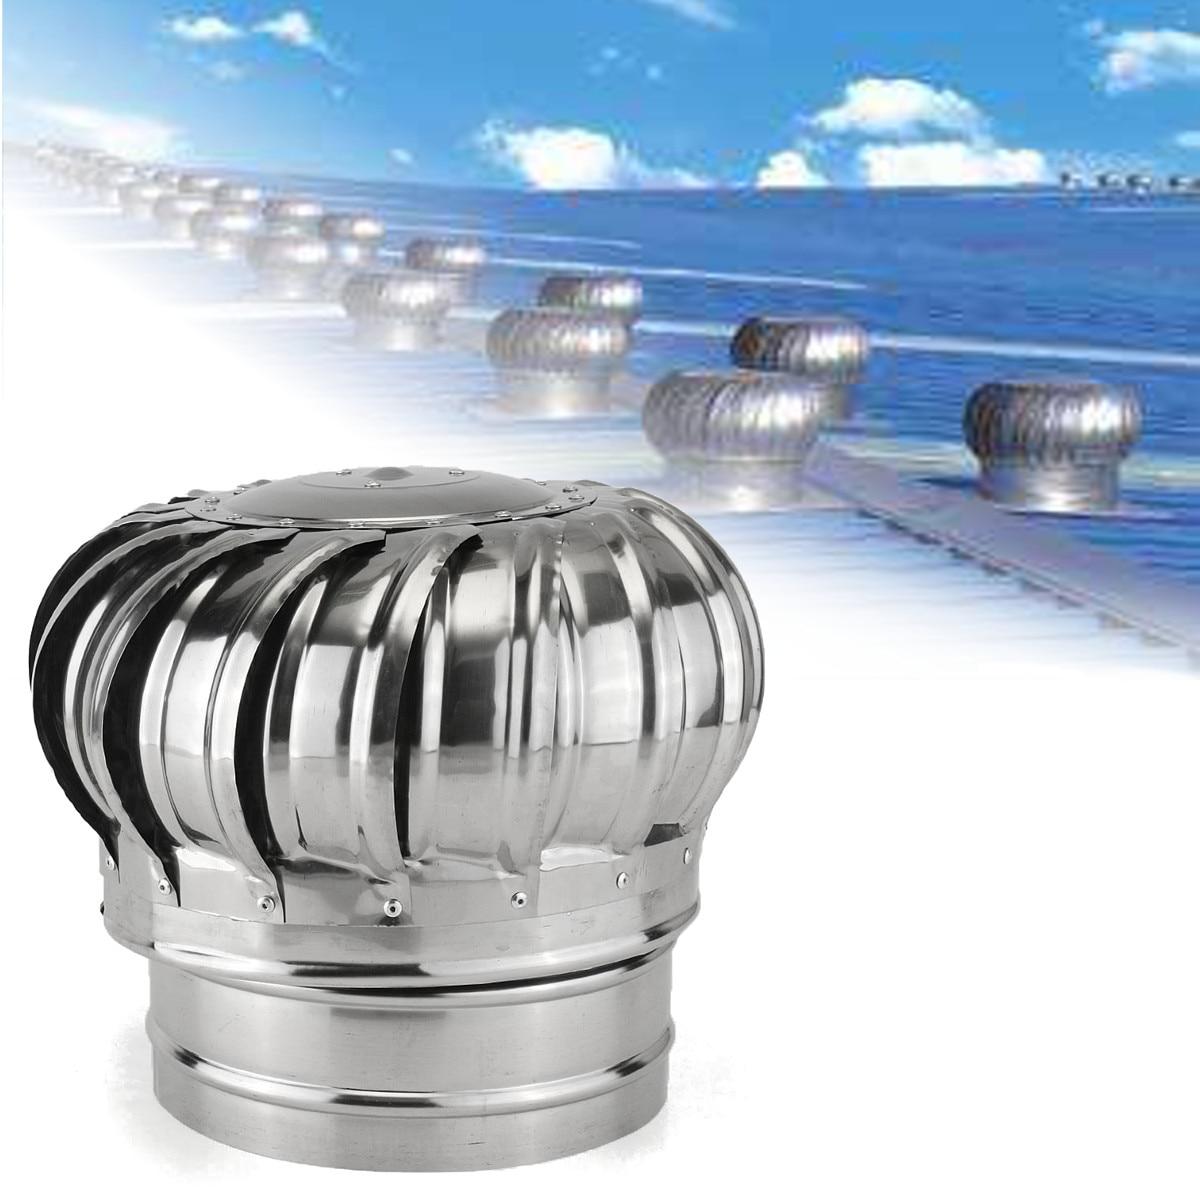 Stainless Steel Roof Ventilator Wind Turbines Air Vent Attic Ventilator 150mm 200mm